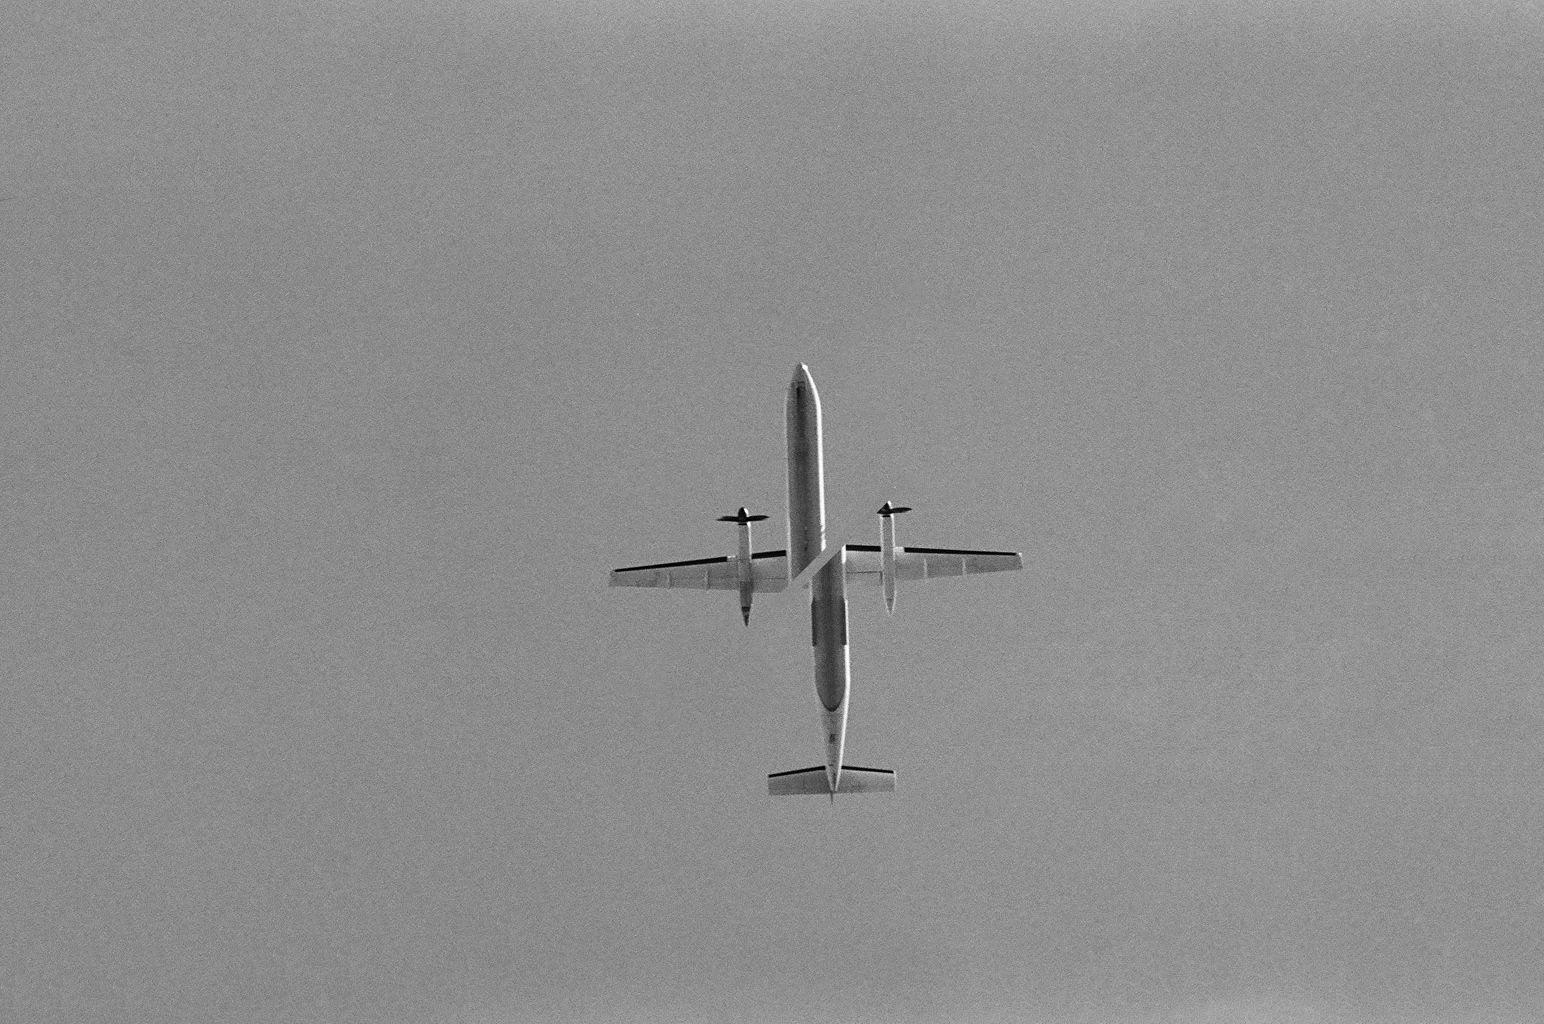 Oceanic Flight 815_2.jpg